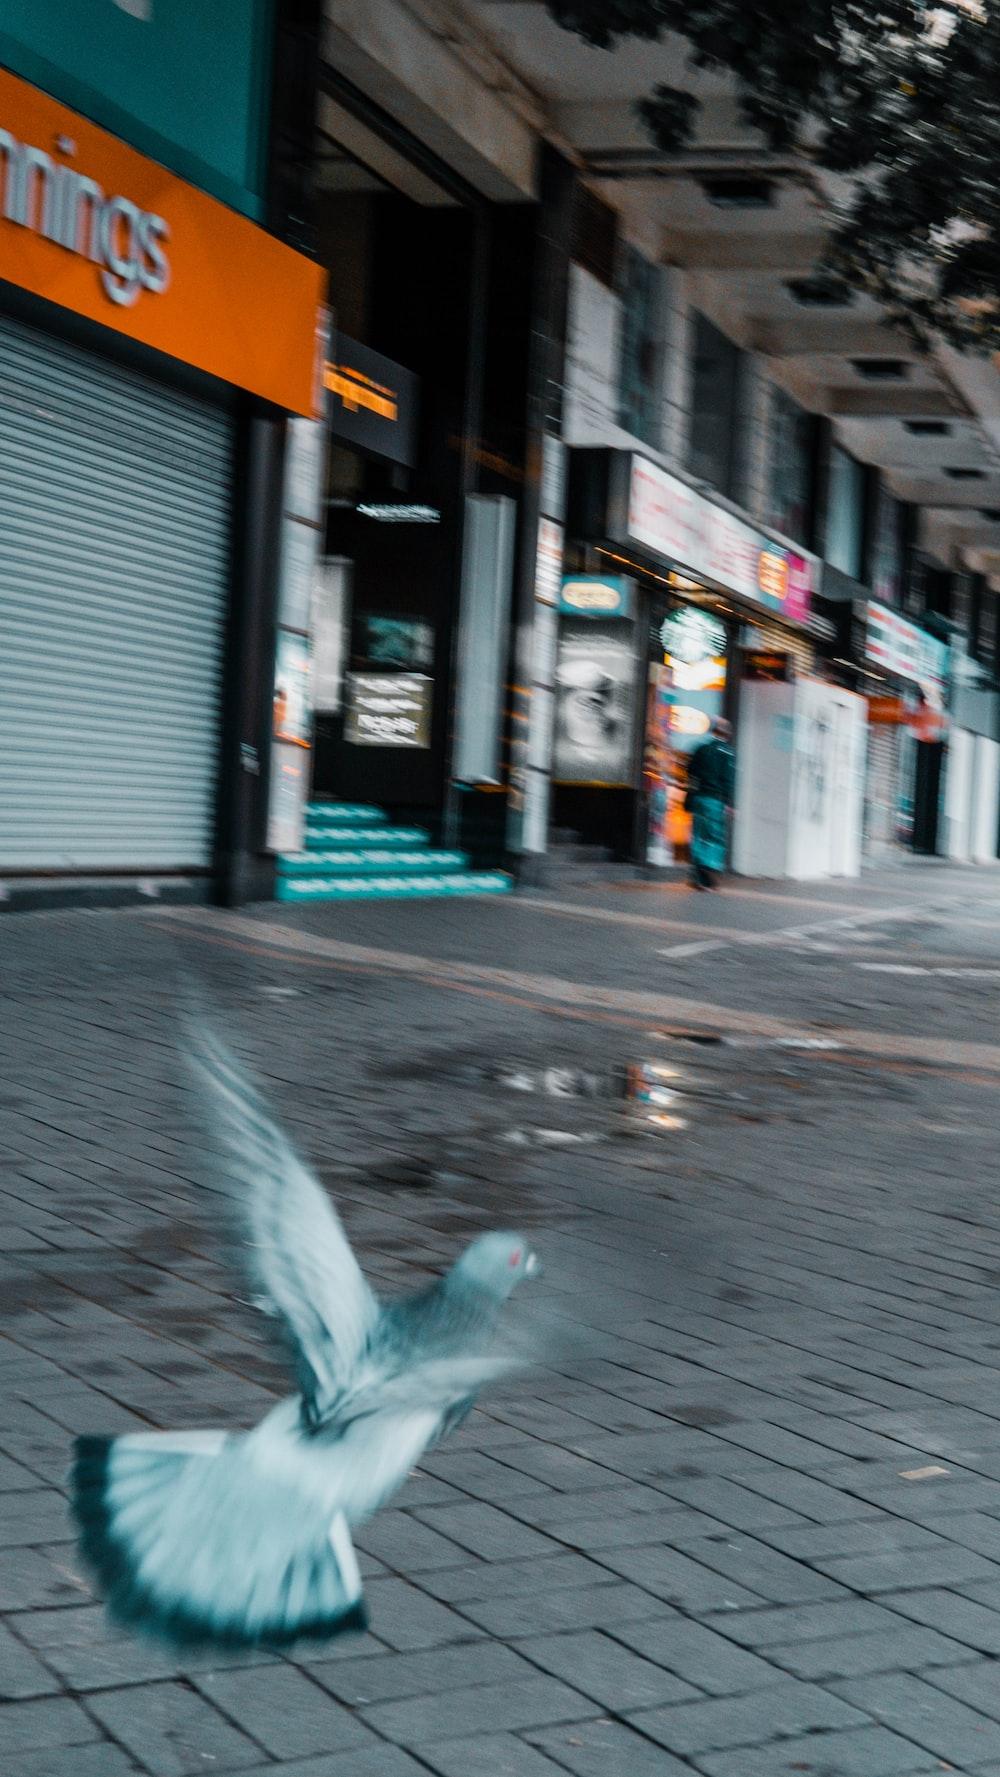 white bird on gray concrete road during daytime